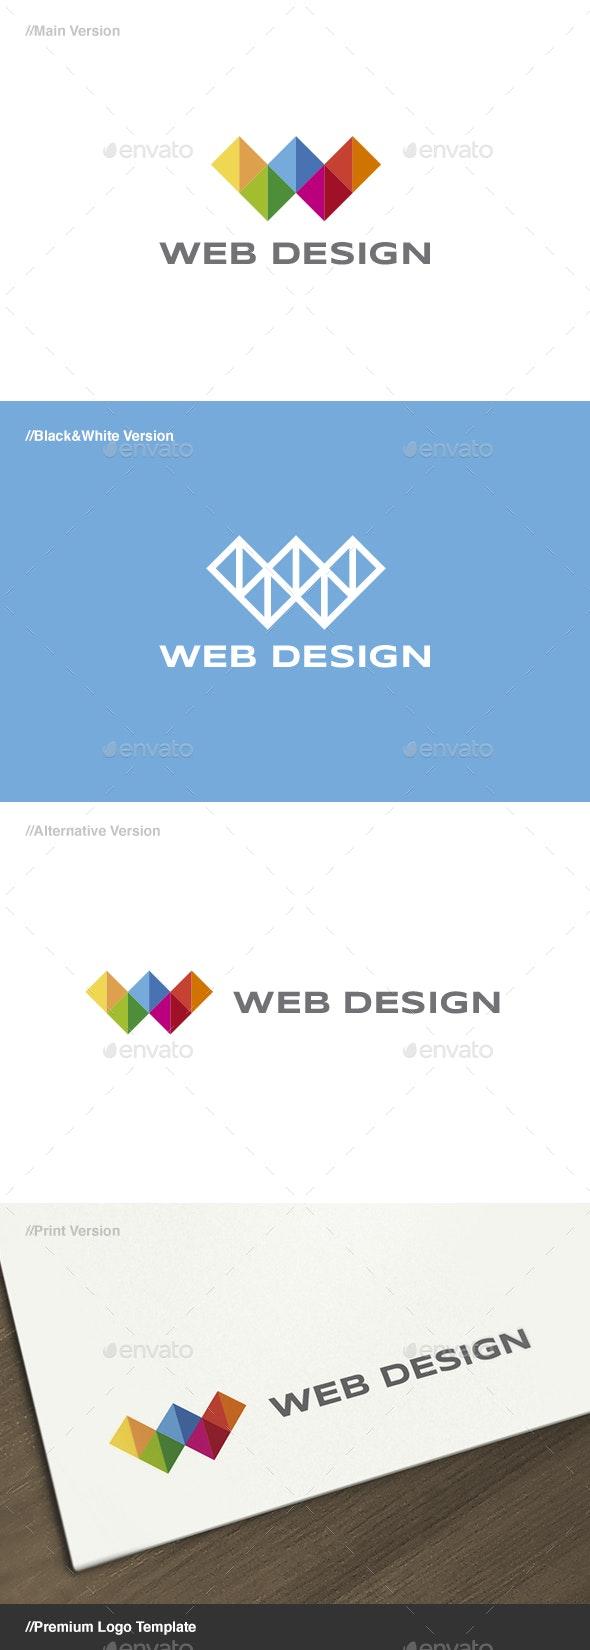 Web Design 3 - Letter W Logo - Letters Logo Templates